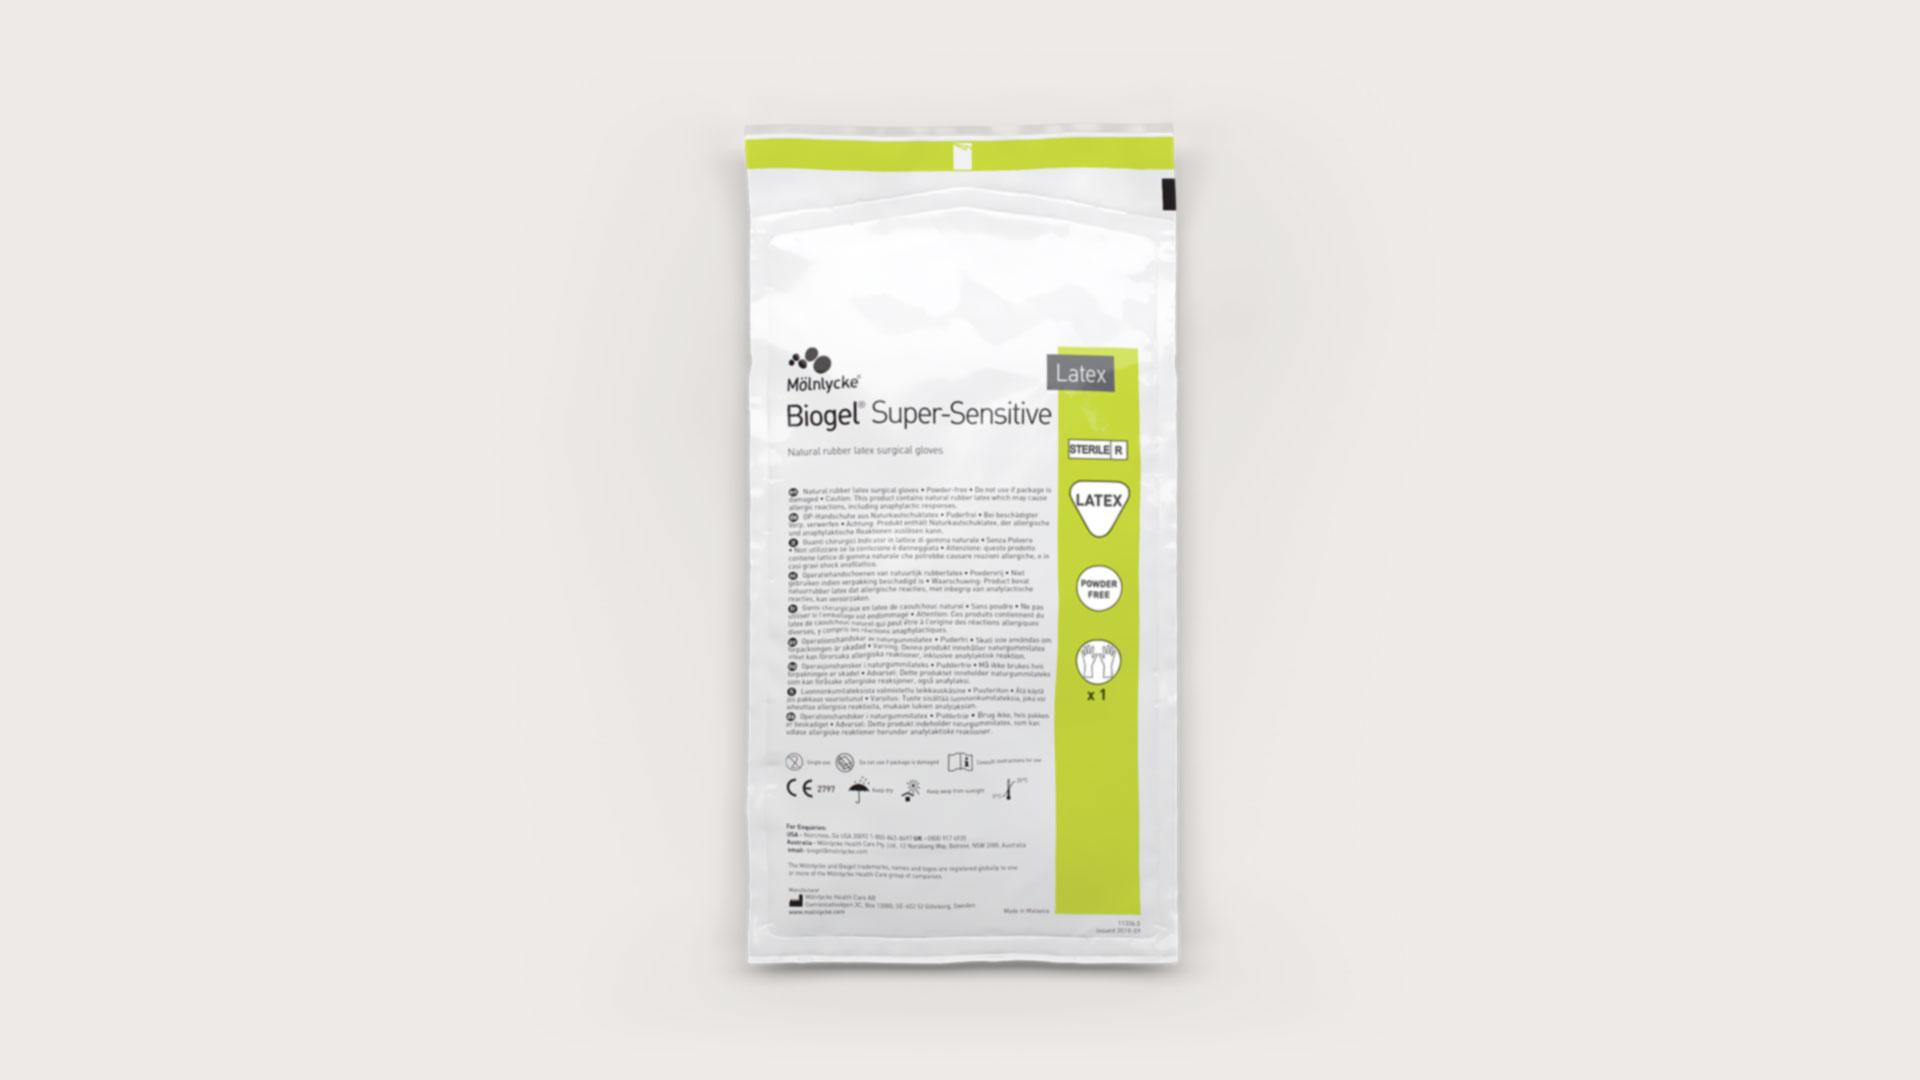 709e72b35c8 Bezpudrové latexové chirurgické rukavice Biogel Super-Sensitive ...